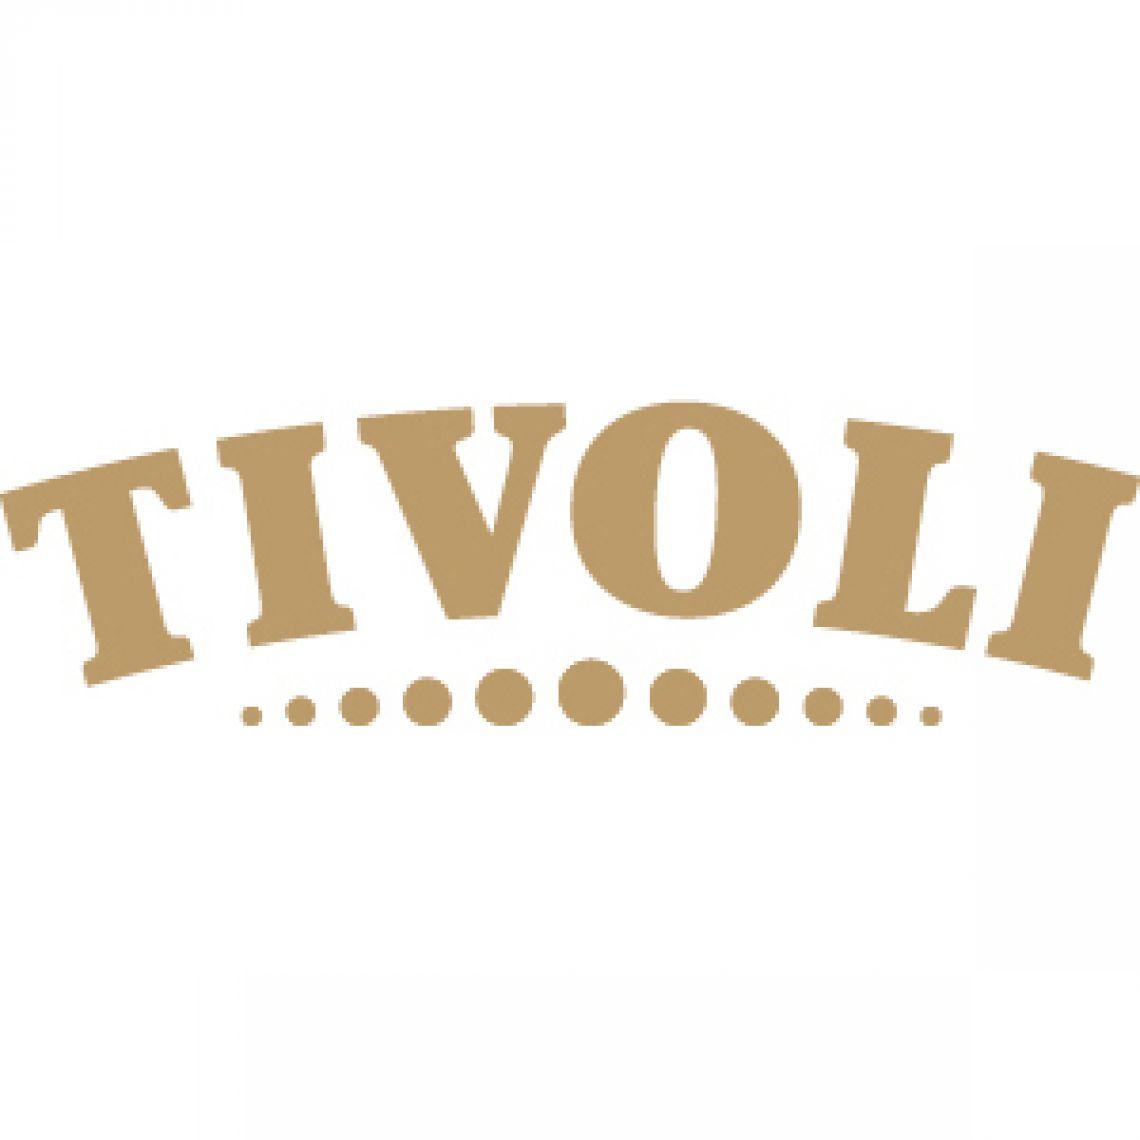 Tivoli gospelfestival 2018